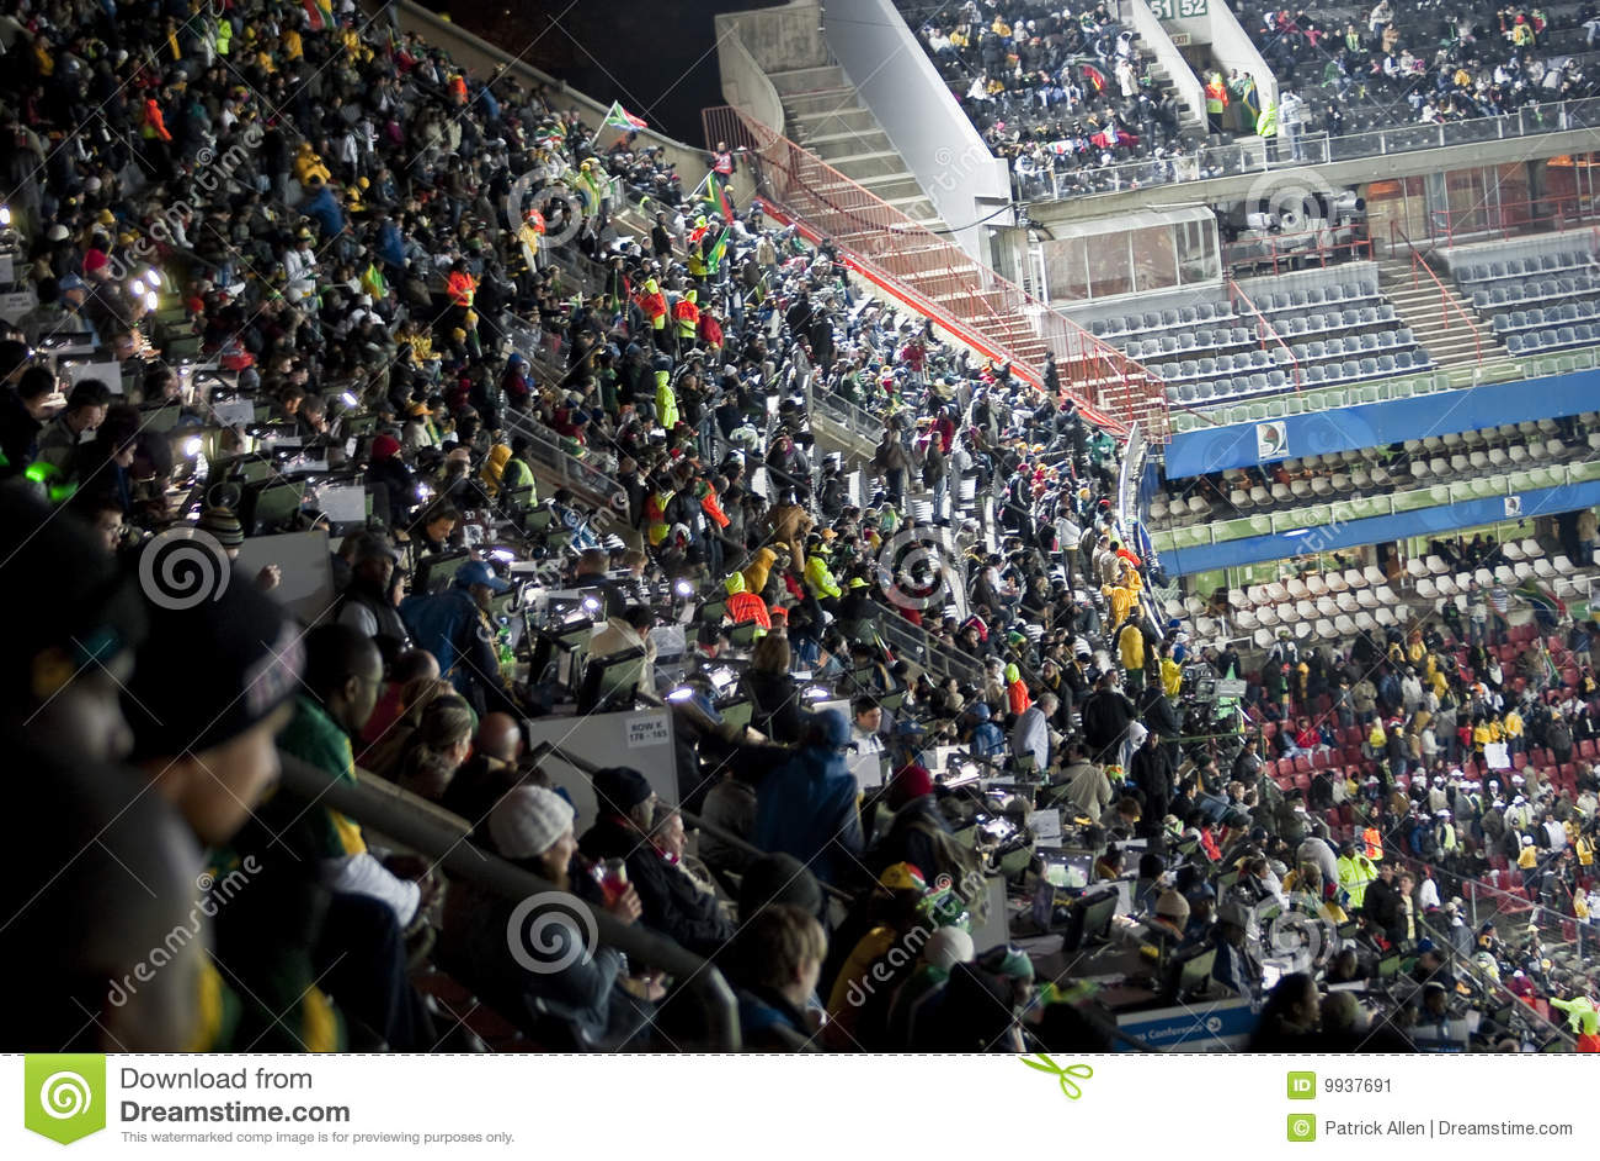 FIFA Confederations Cup 2009 - Crowds